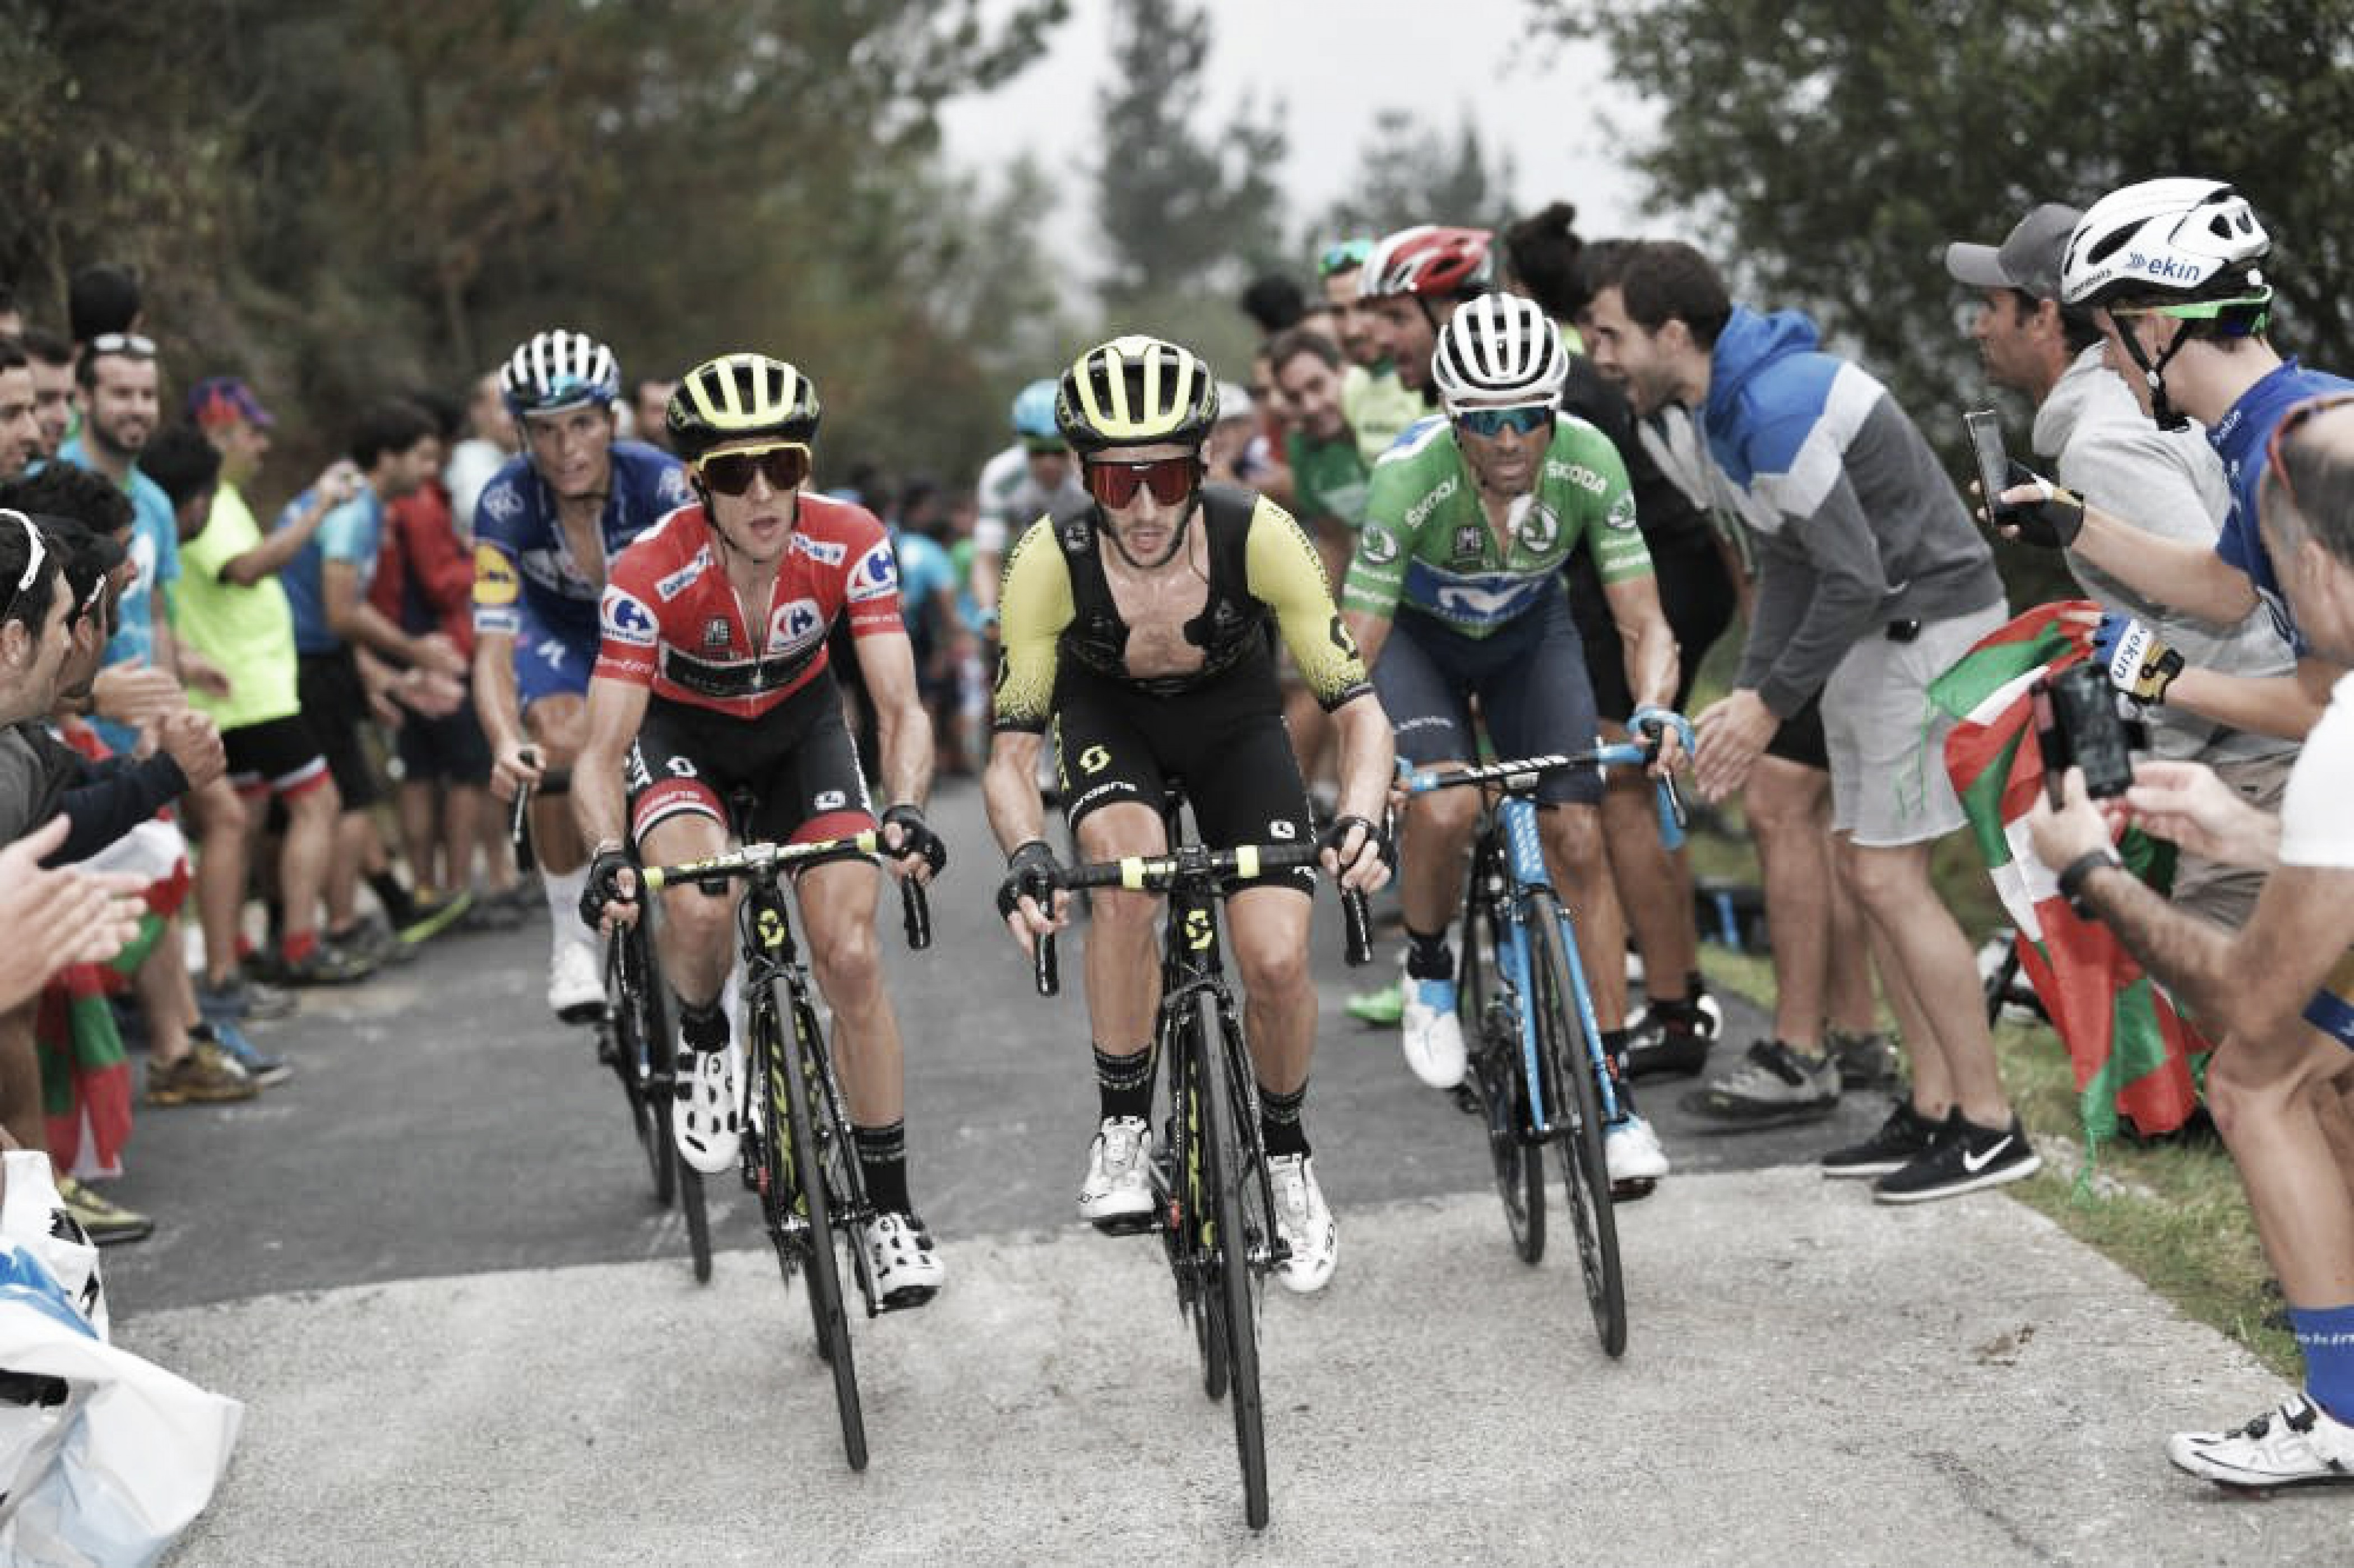 Resumen de la etapa 20 de la Vuelta a España 2018: Enric Mas, 'gallo' en La Gallina